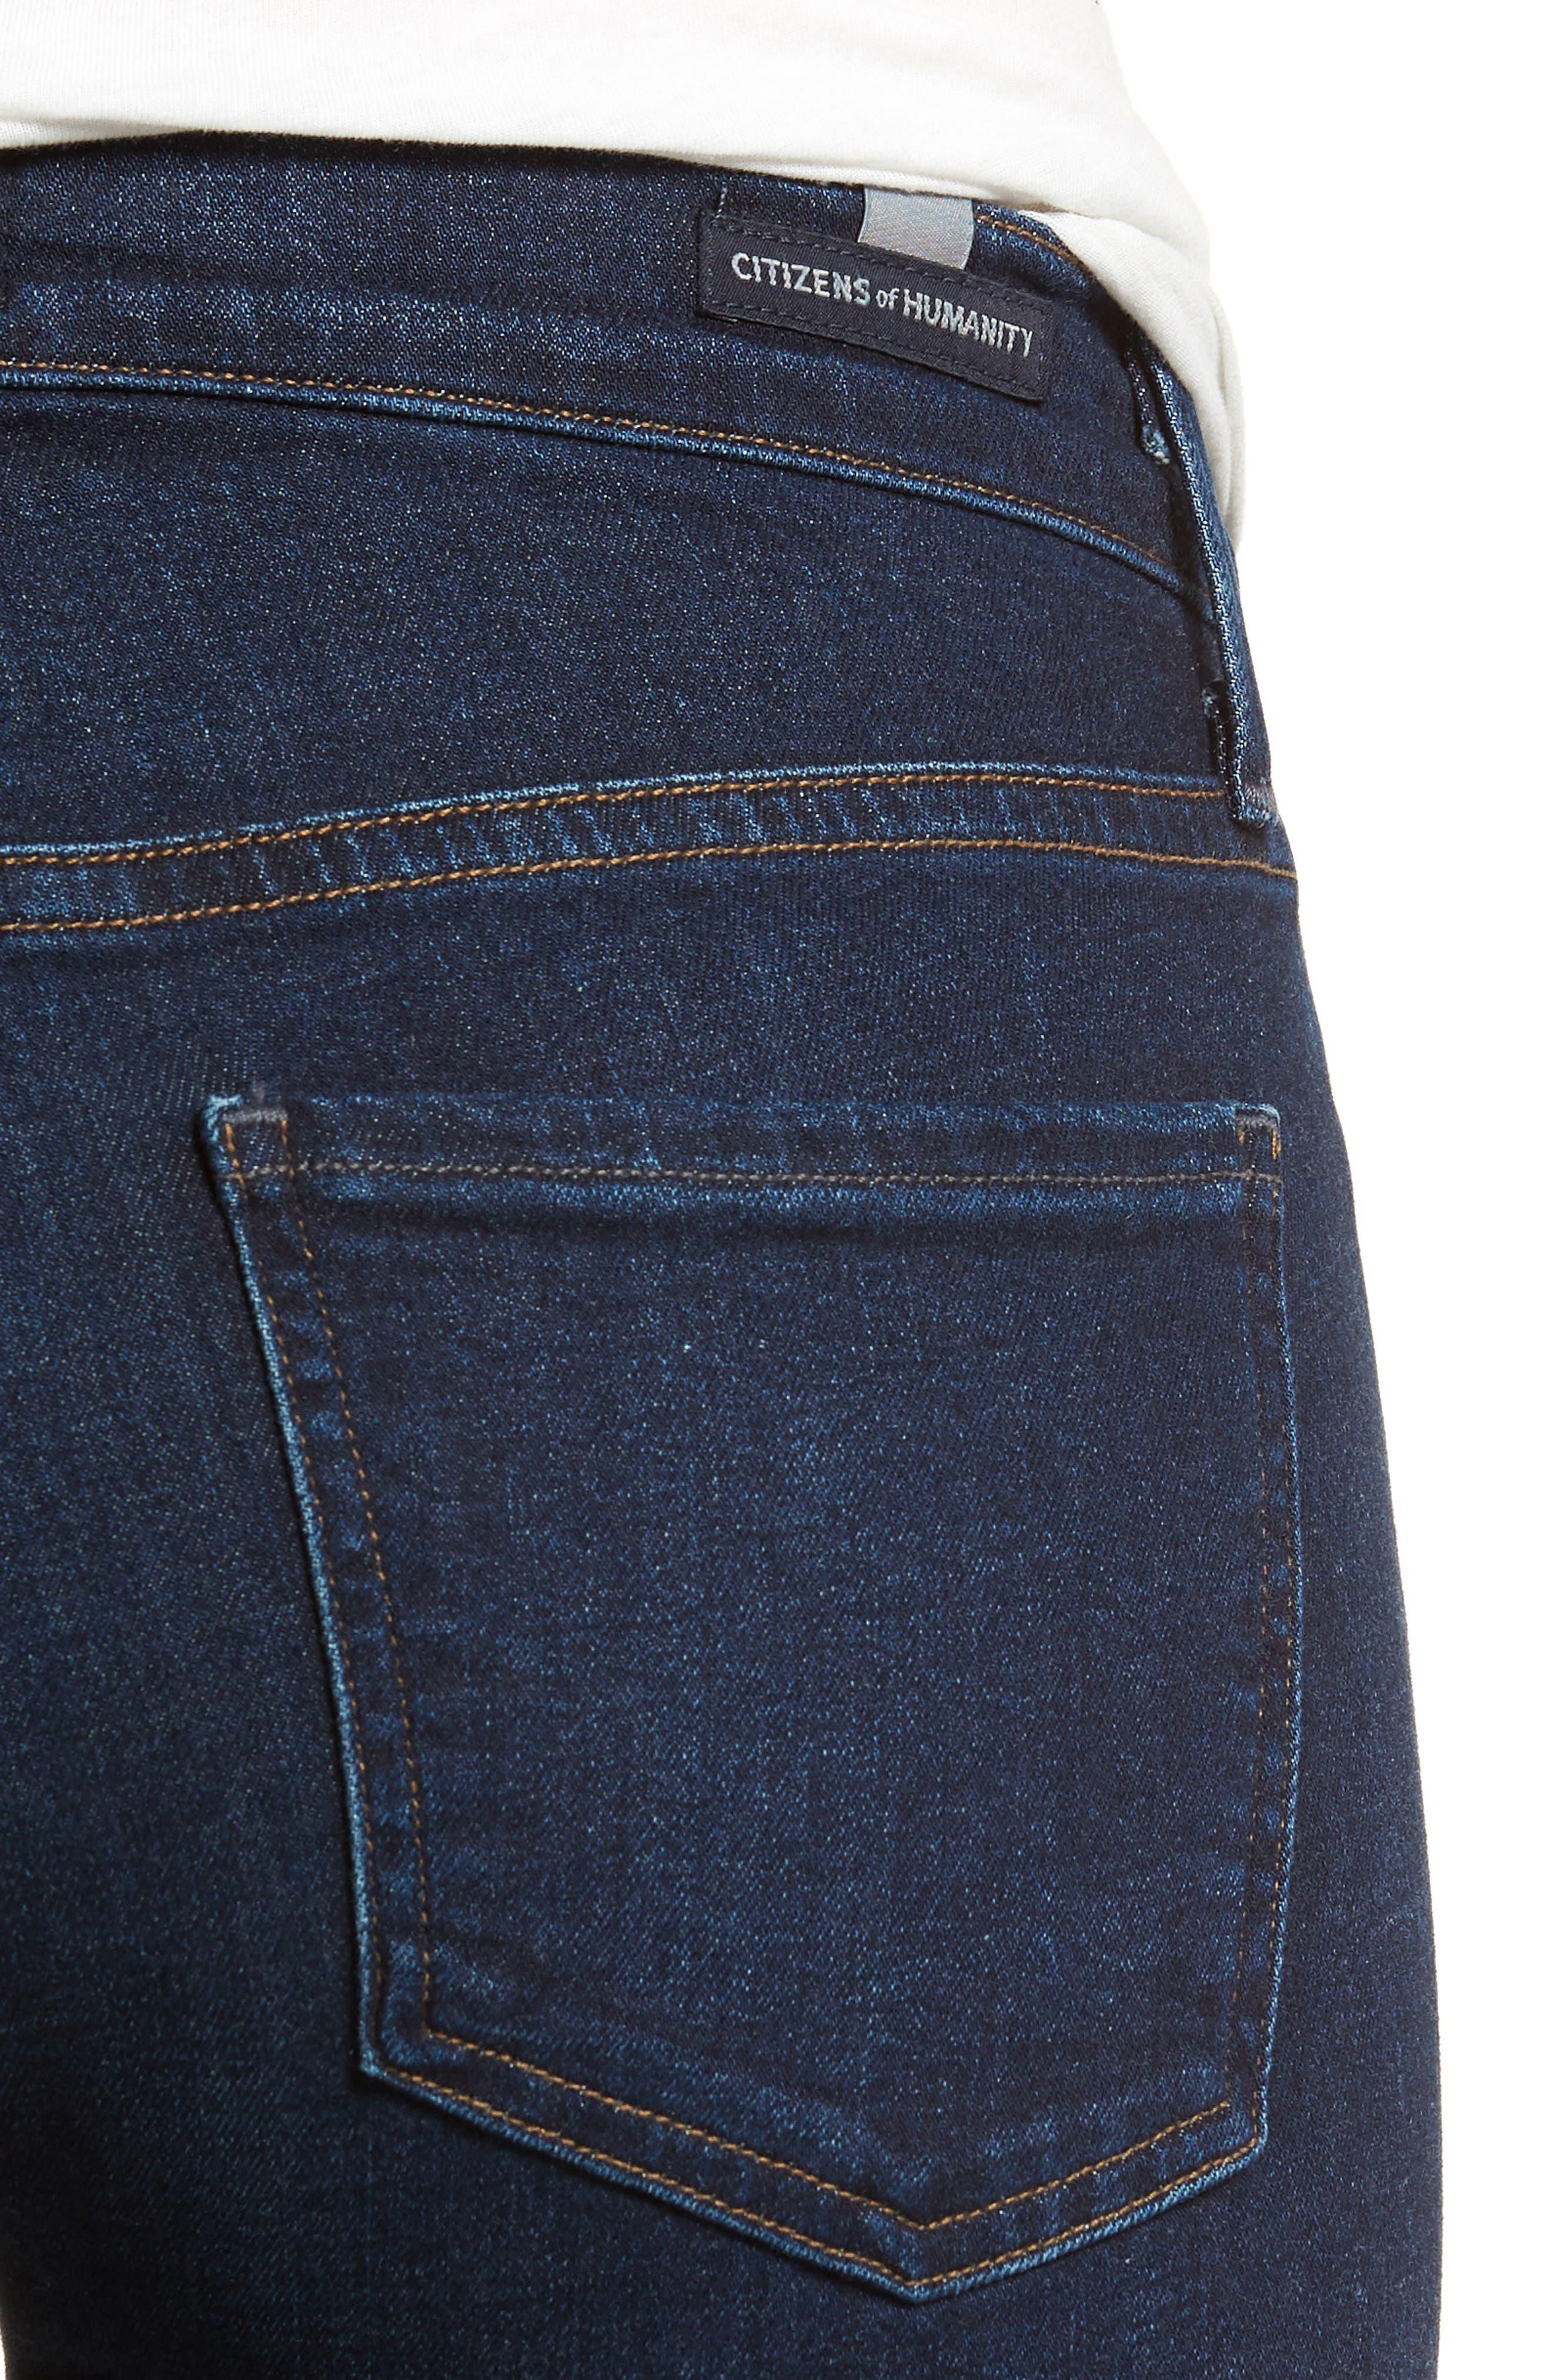 Emannuelle Bootcut Jeans,                             Alternate thumbnail 4, color,                             GALAXY